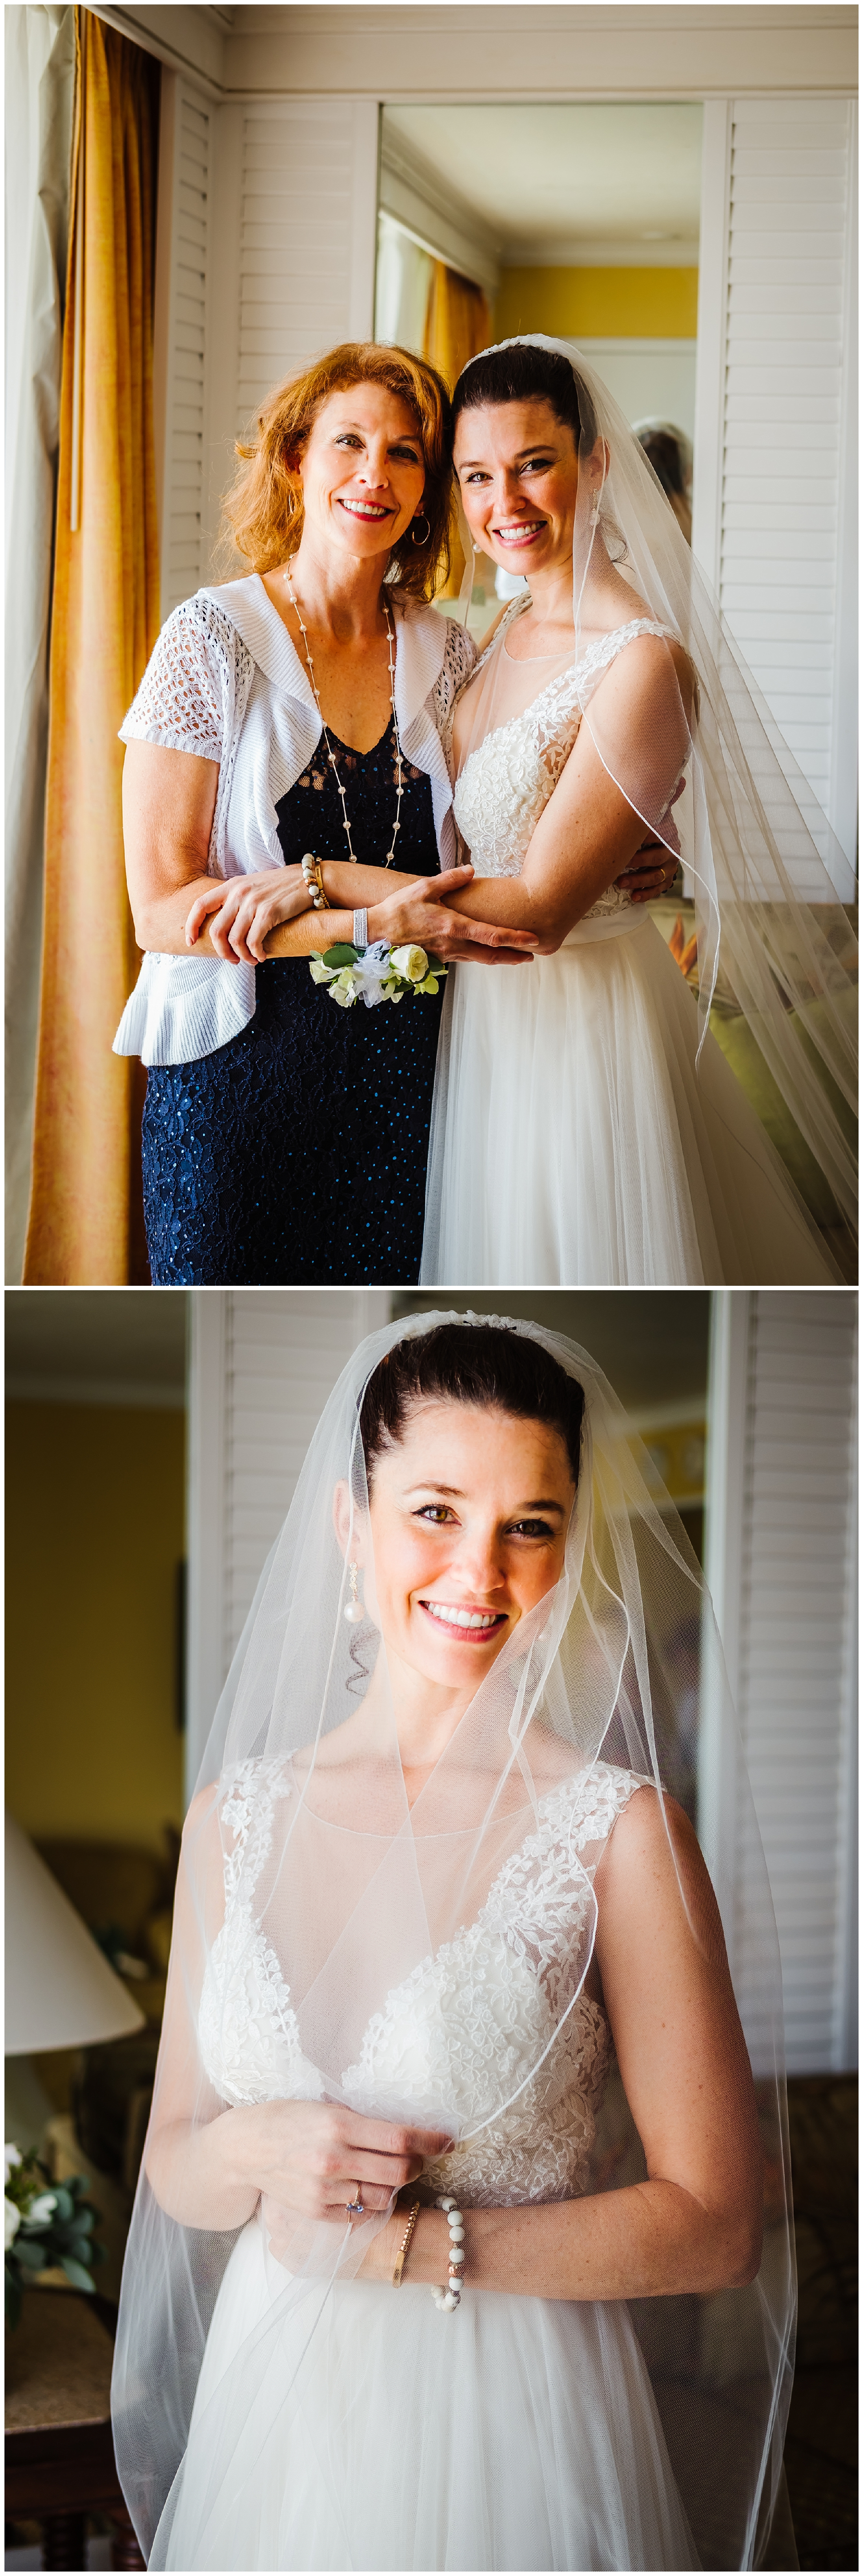 tampa-wedding-photographer-tradewinds-beach-family-elopement_0076.jpg